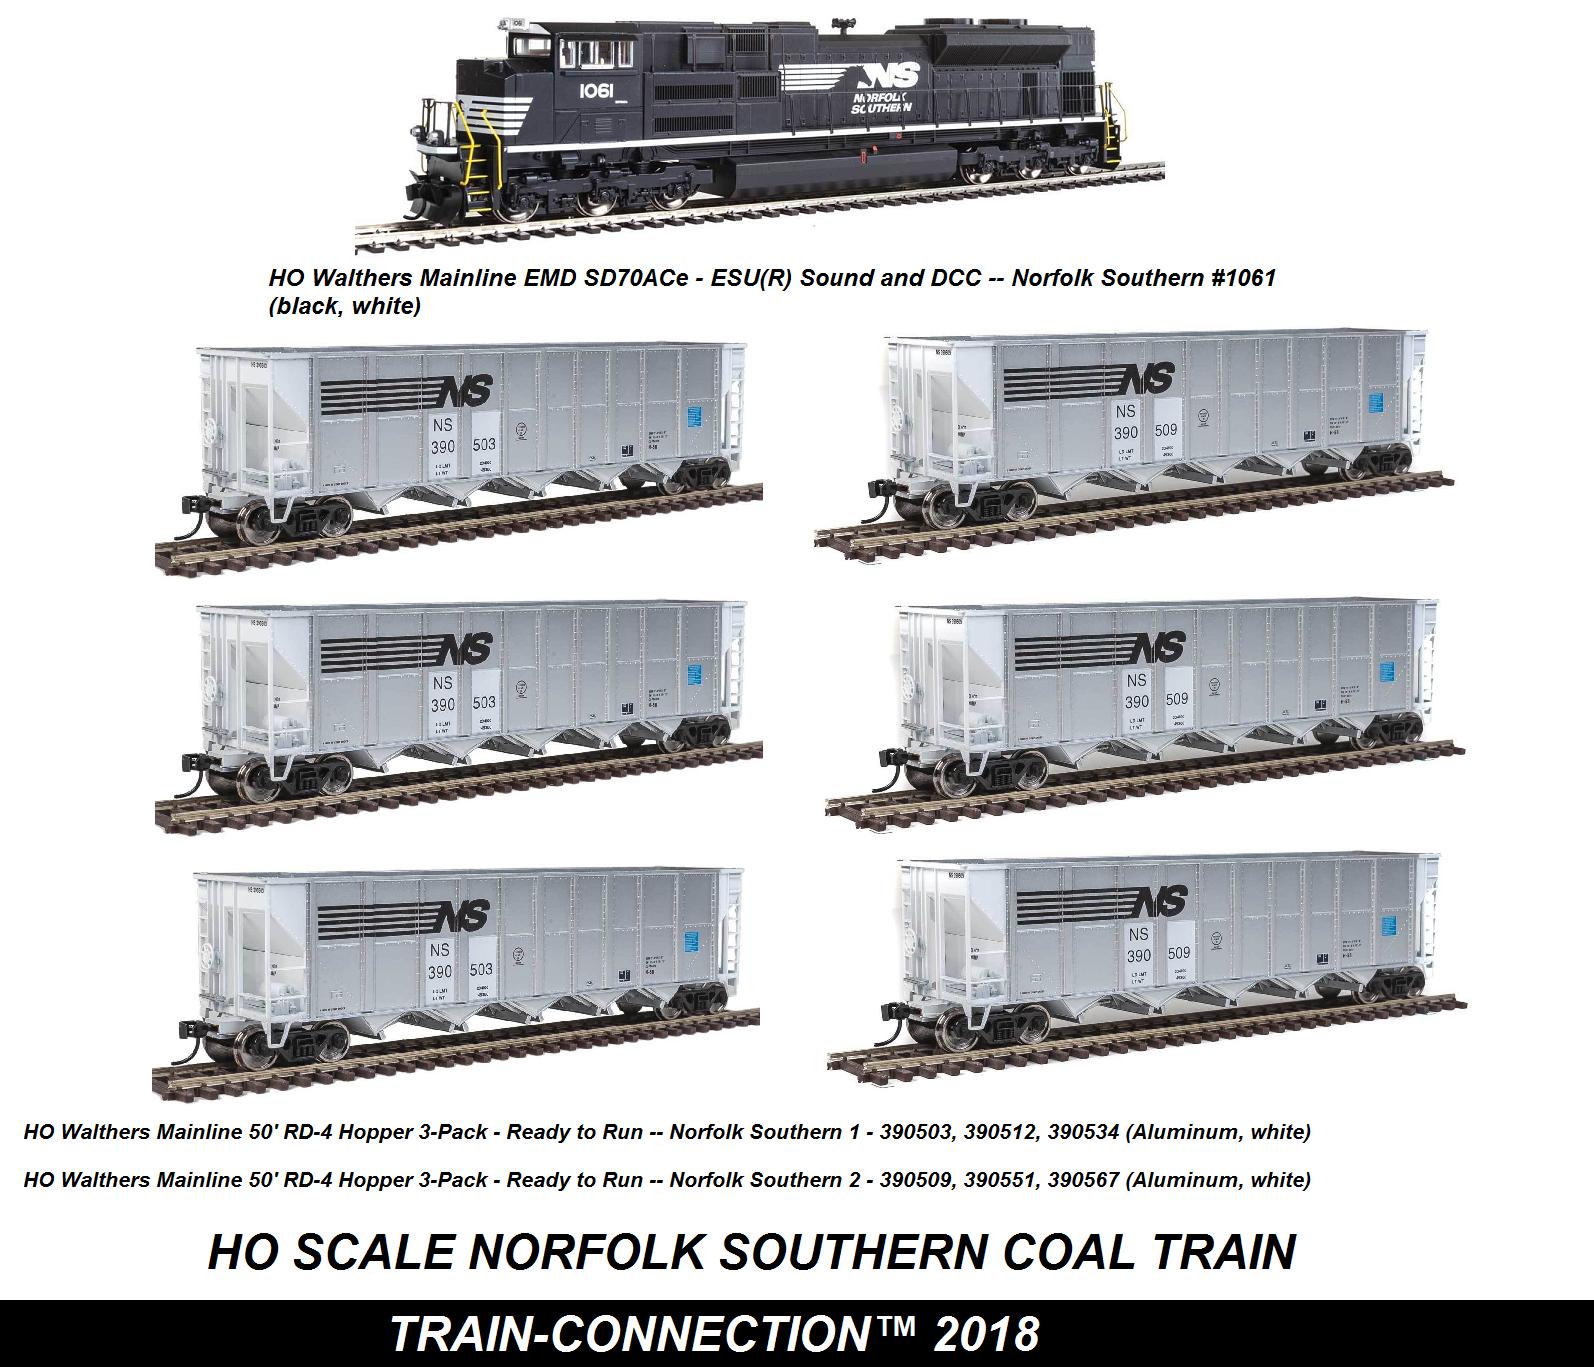 compras online de deportes Escala Escala Escala Ho Norfolk Southern Conjunto de tren de carbón  apresurado a ver